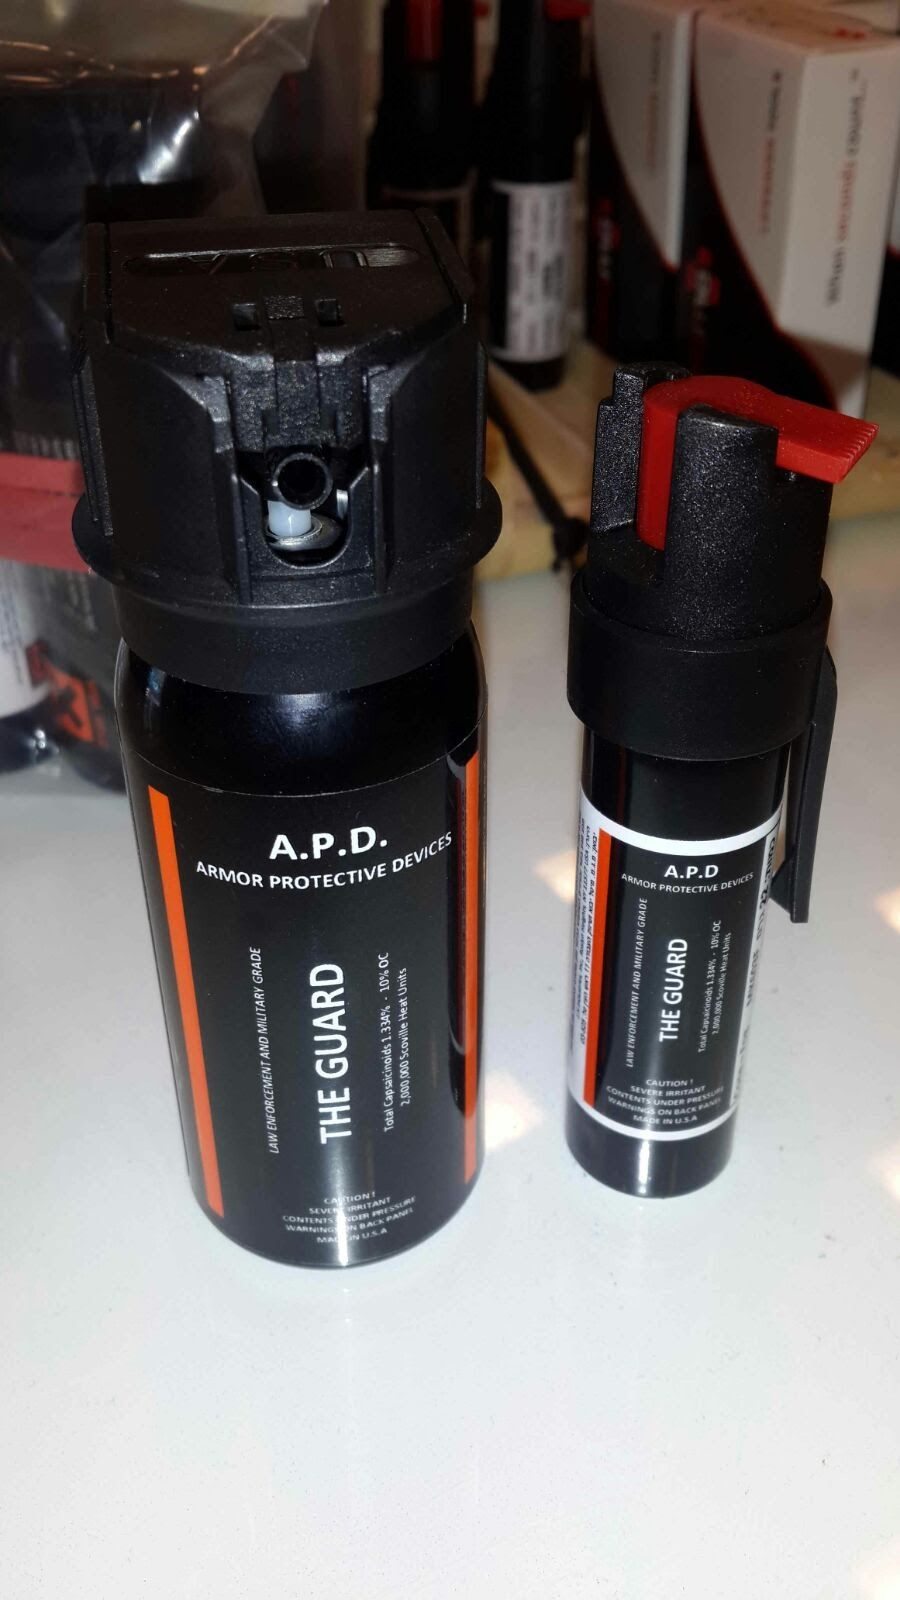 APD - תרסיס פלפל אישי להגנה עצמית איי.פי.די - Armor protective devices Pepper Spray